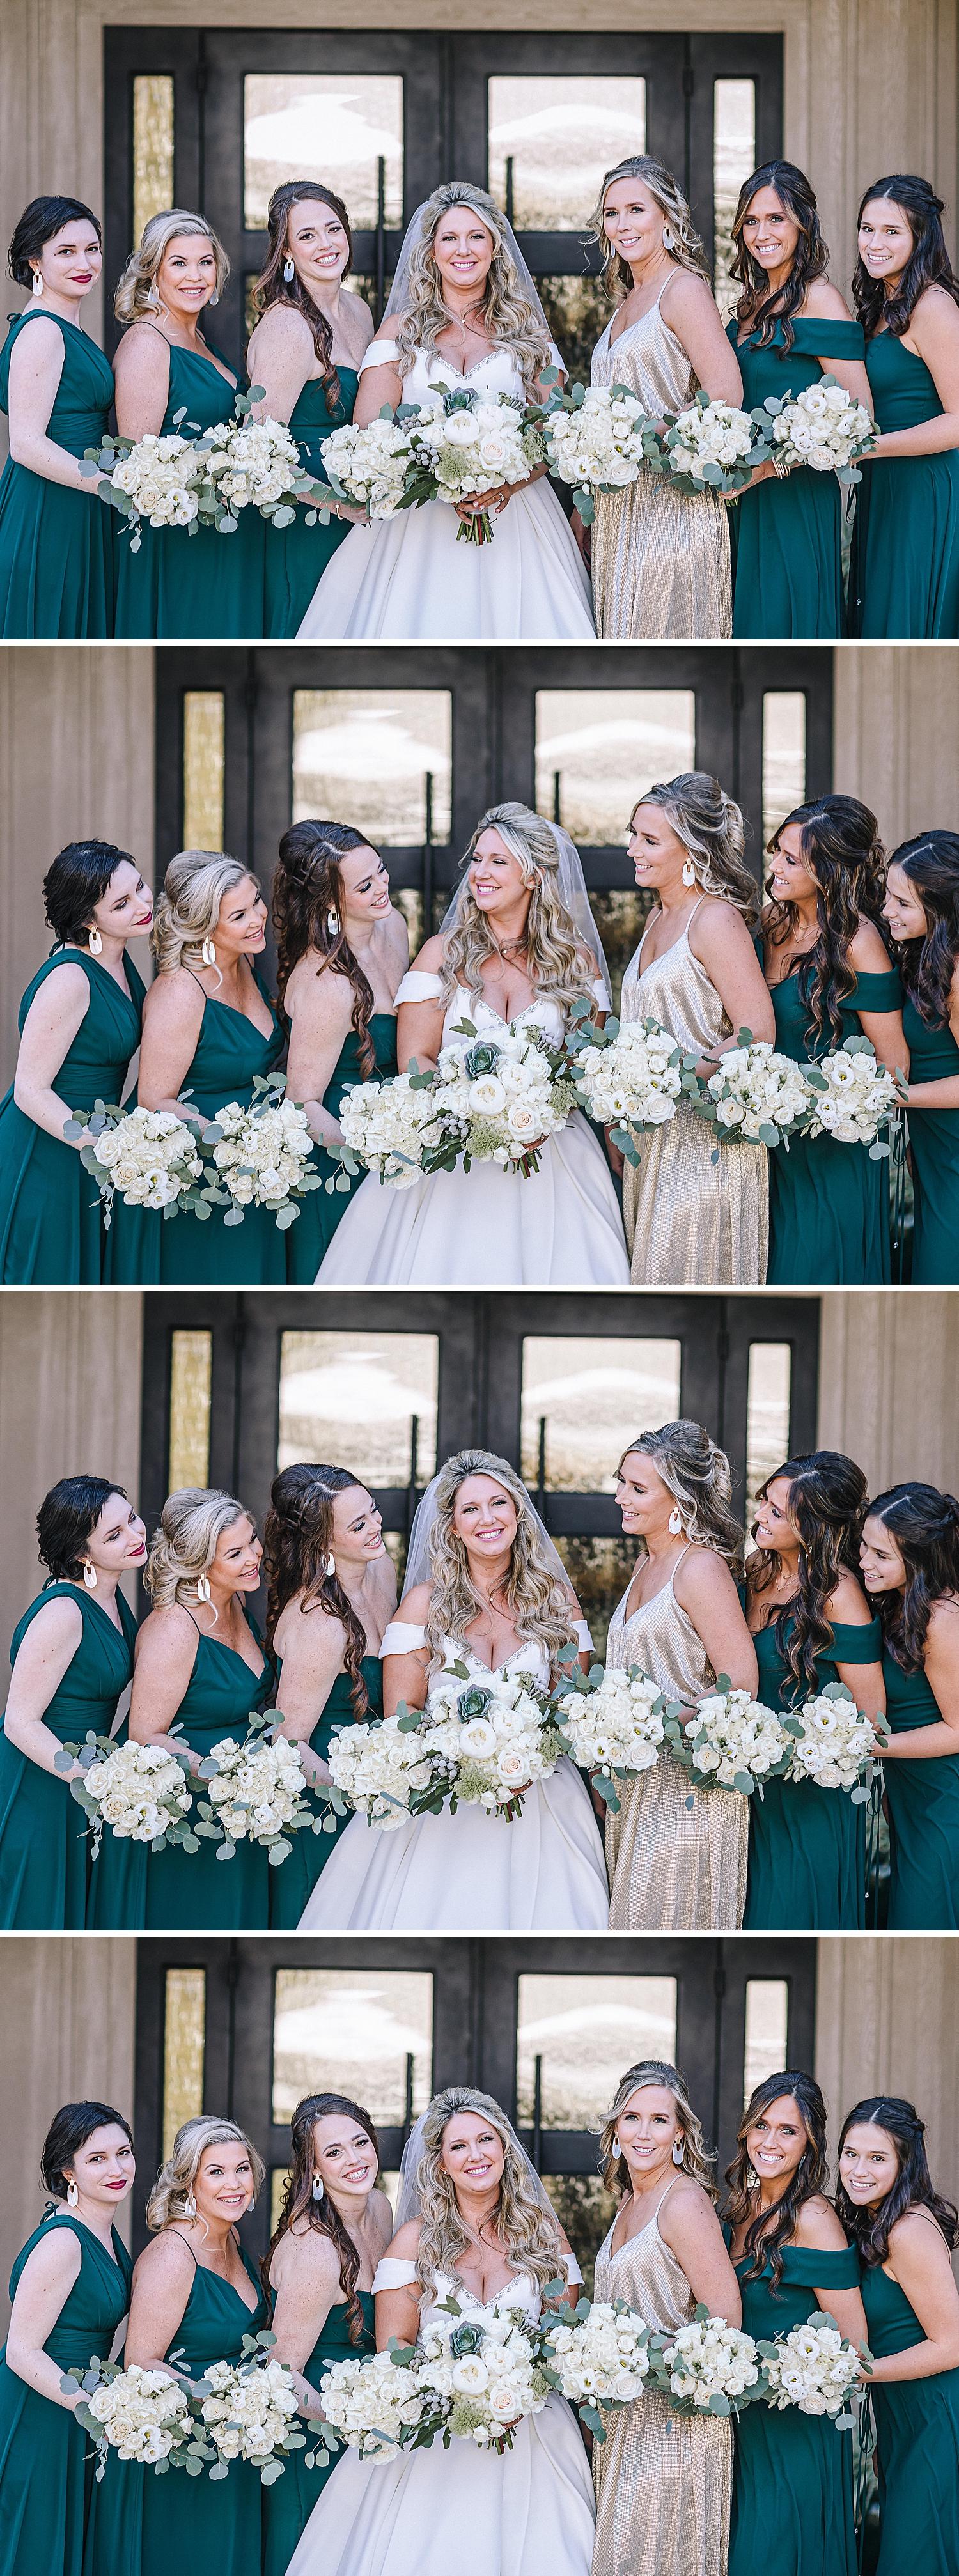 Magnolia-Halle-Wedding-San-Antonio-Texas-Bride-Grom_0037.jpg